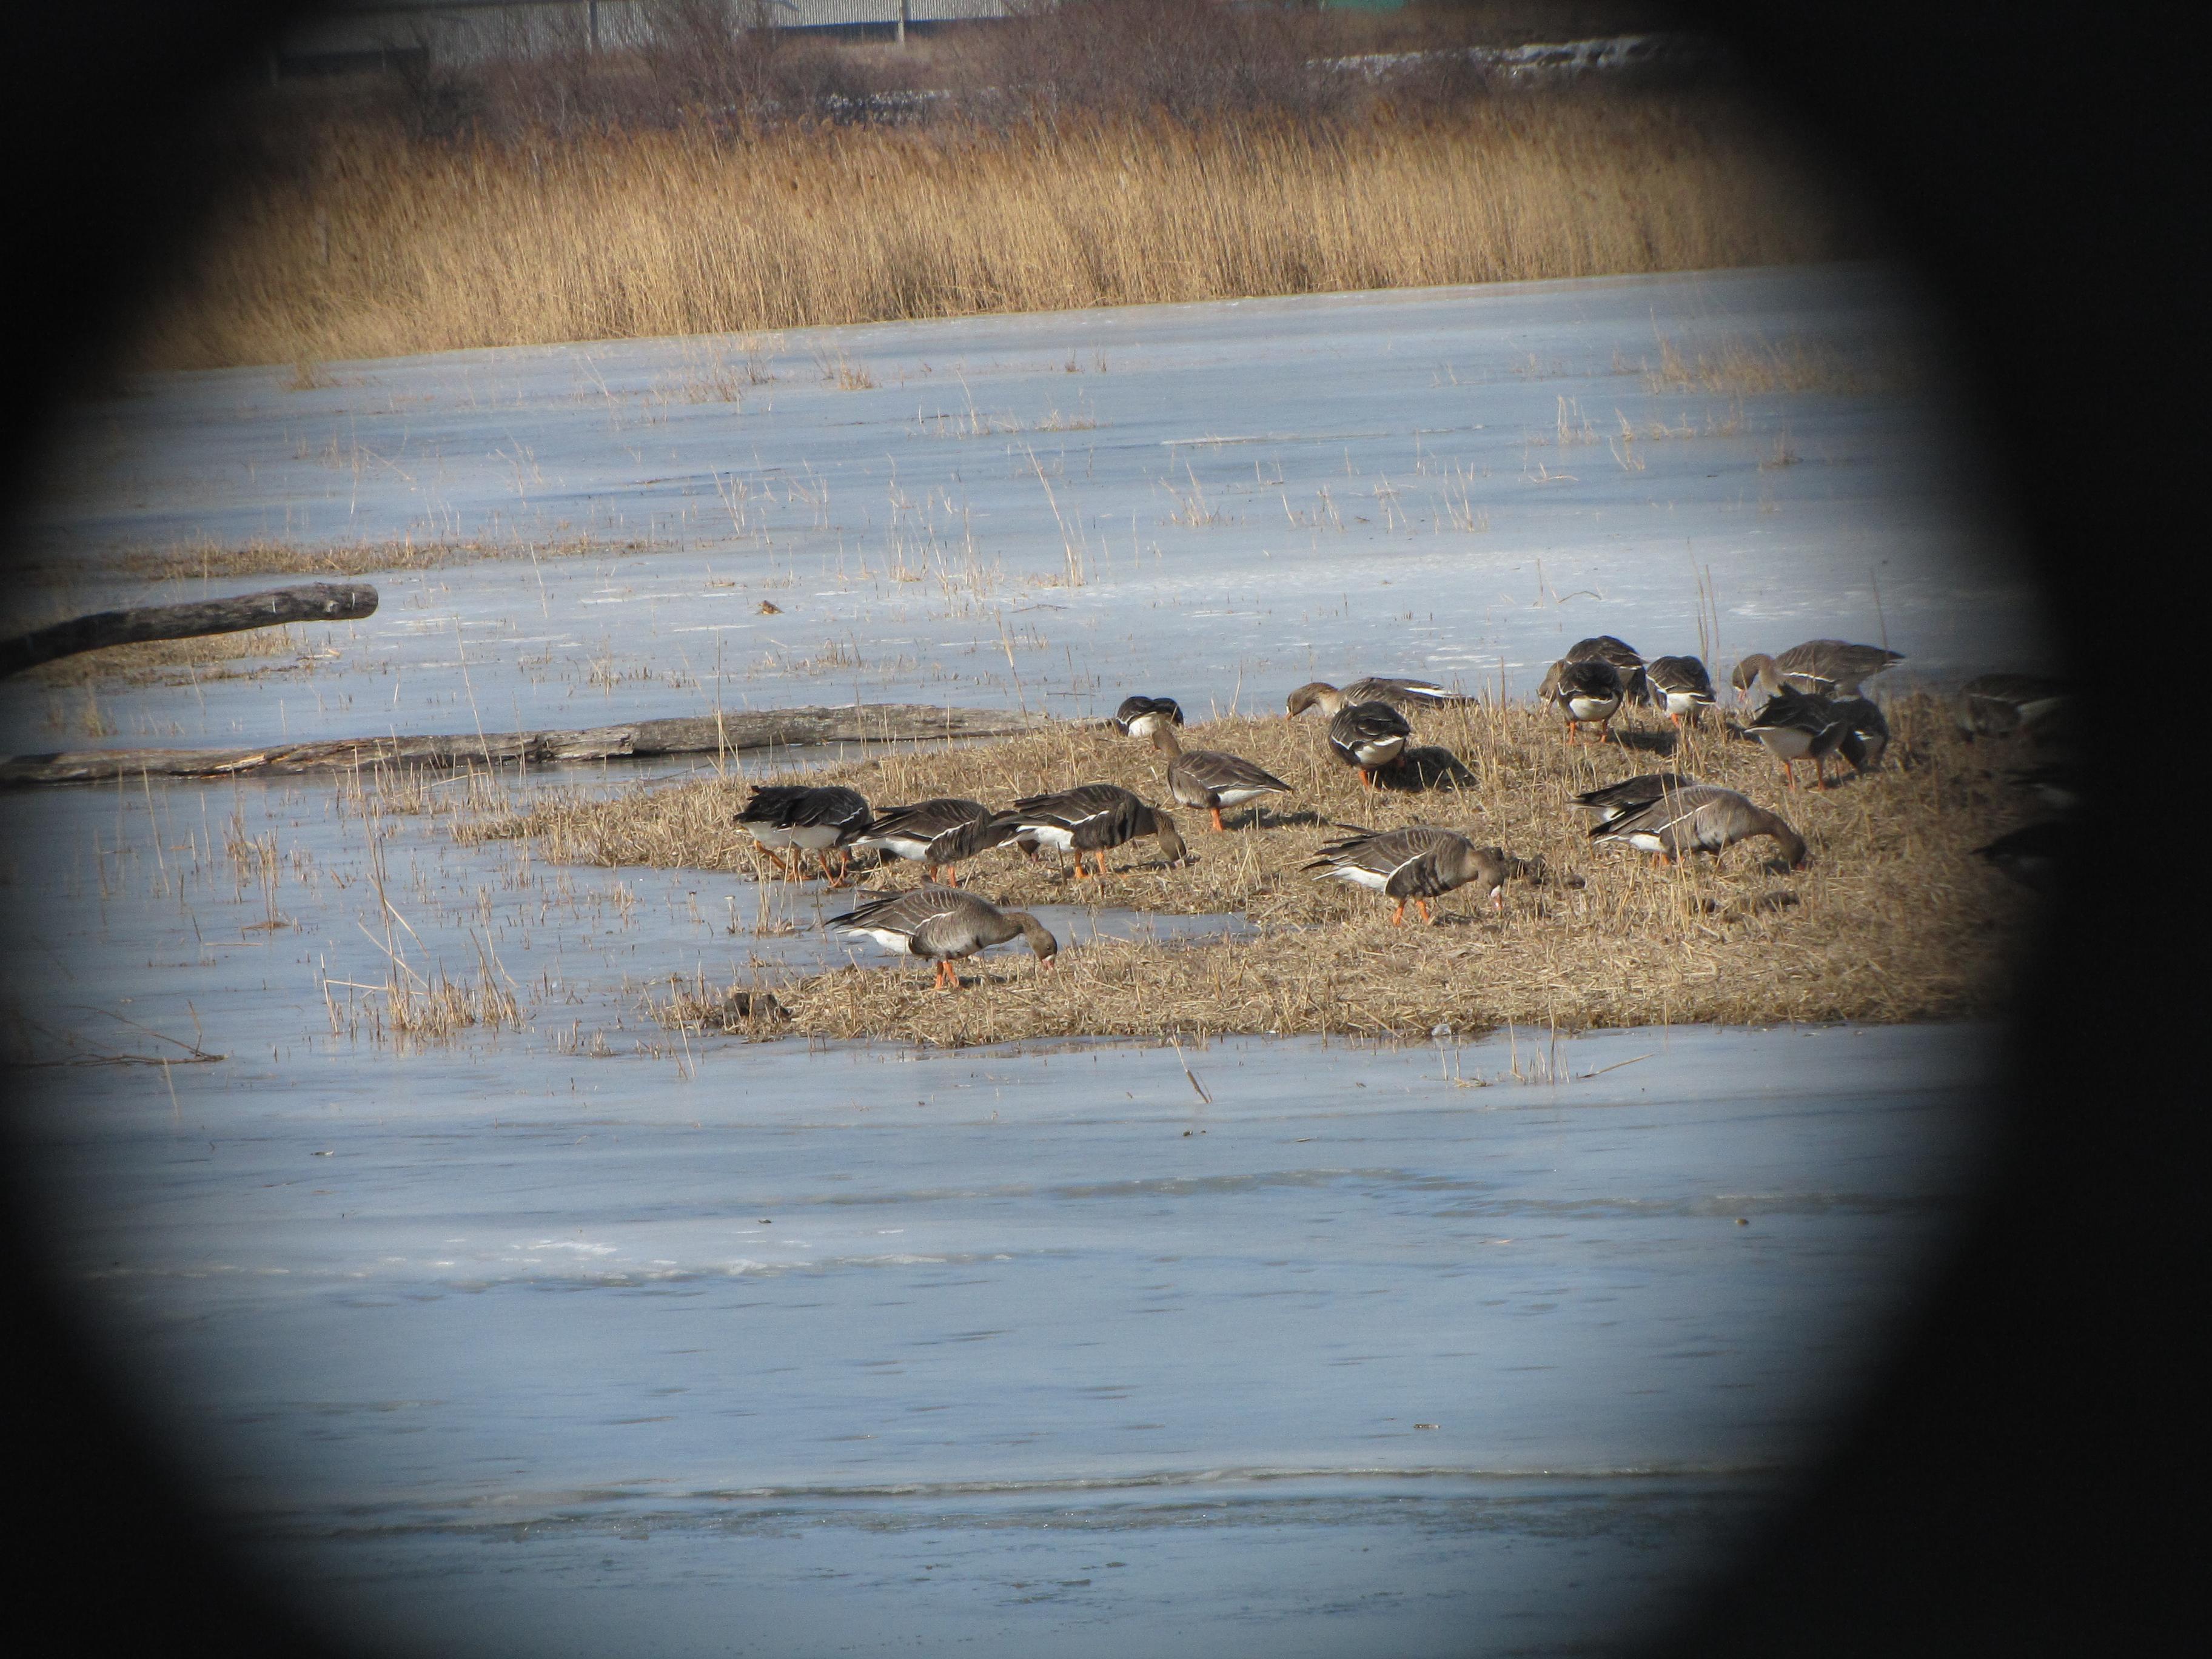 Januarsko štetje vodnih ptic (IWC) 2015